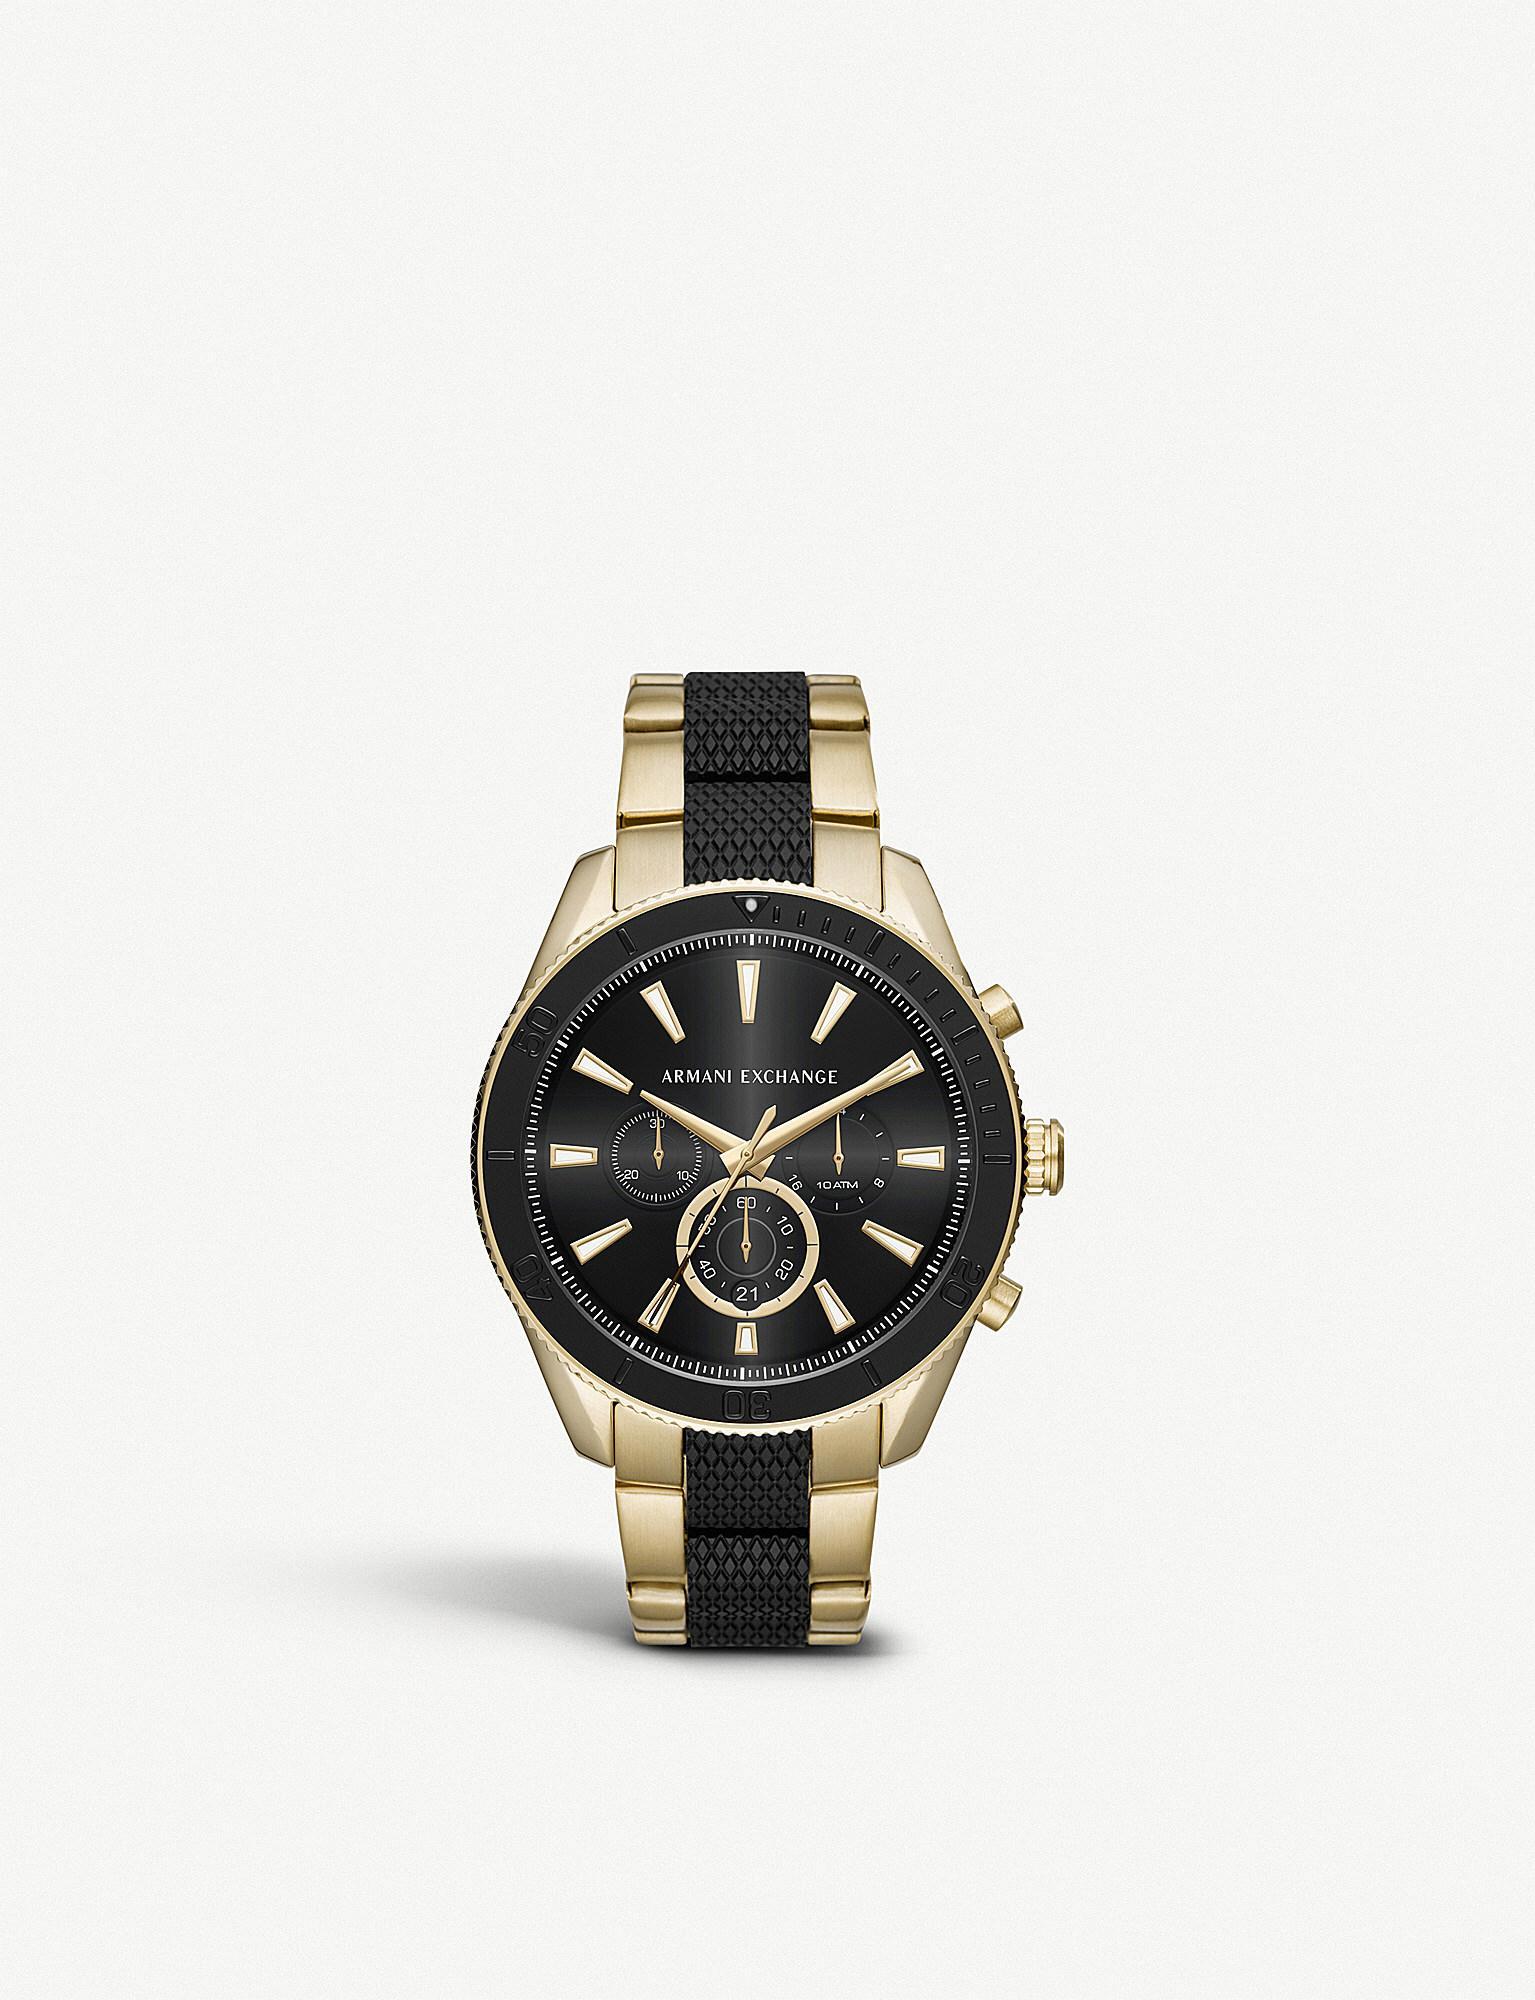 3b186fdd16a8 Lyst - Michael Kors Ax1814 Gold-plated Chronograph Watch in Metallic ...